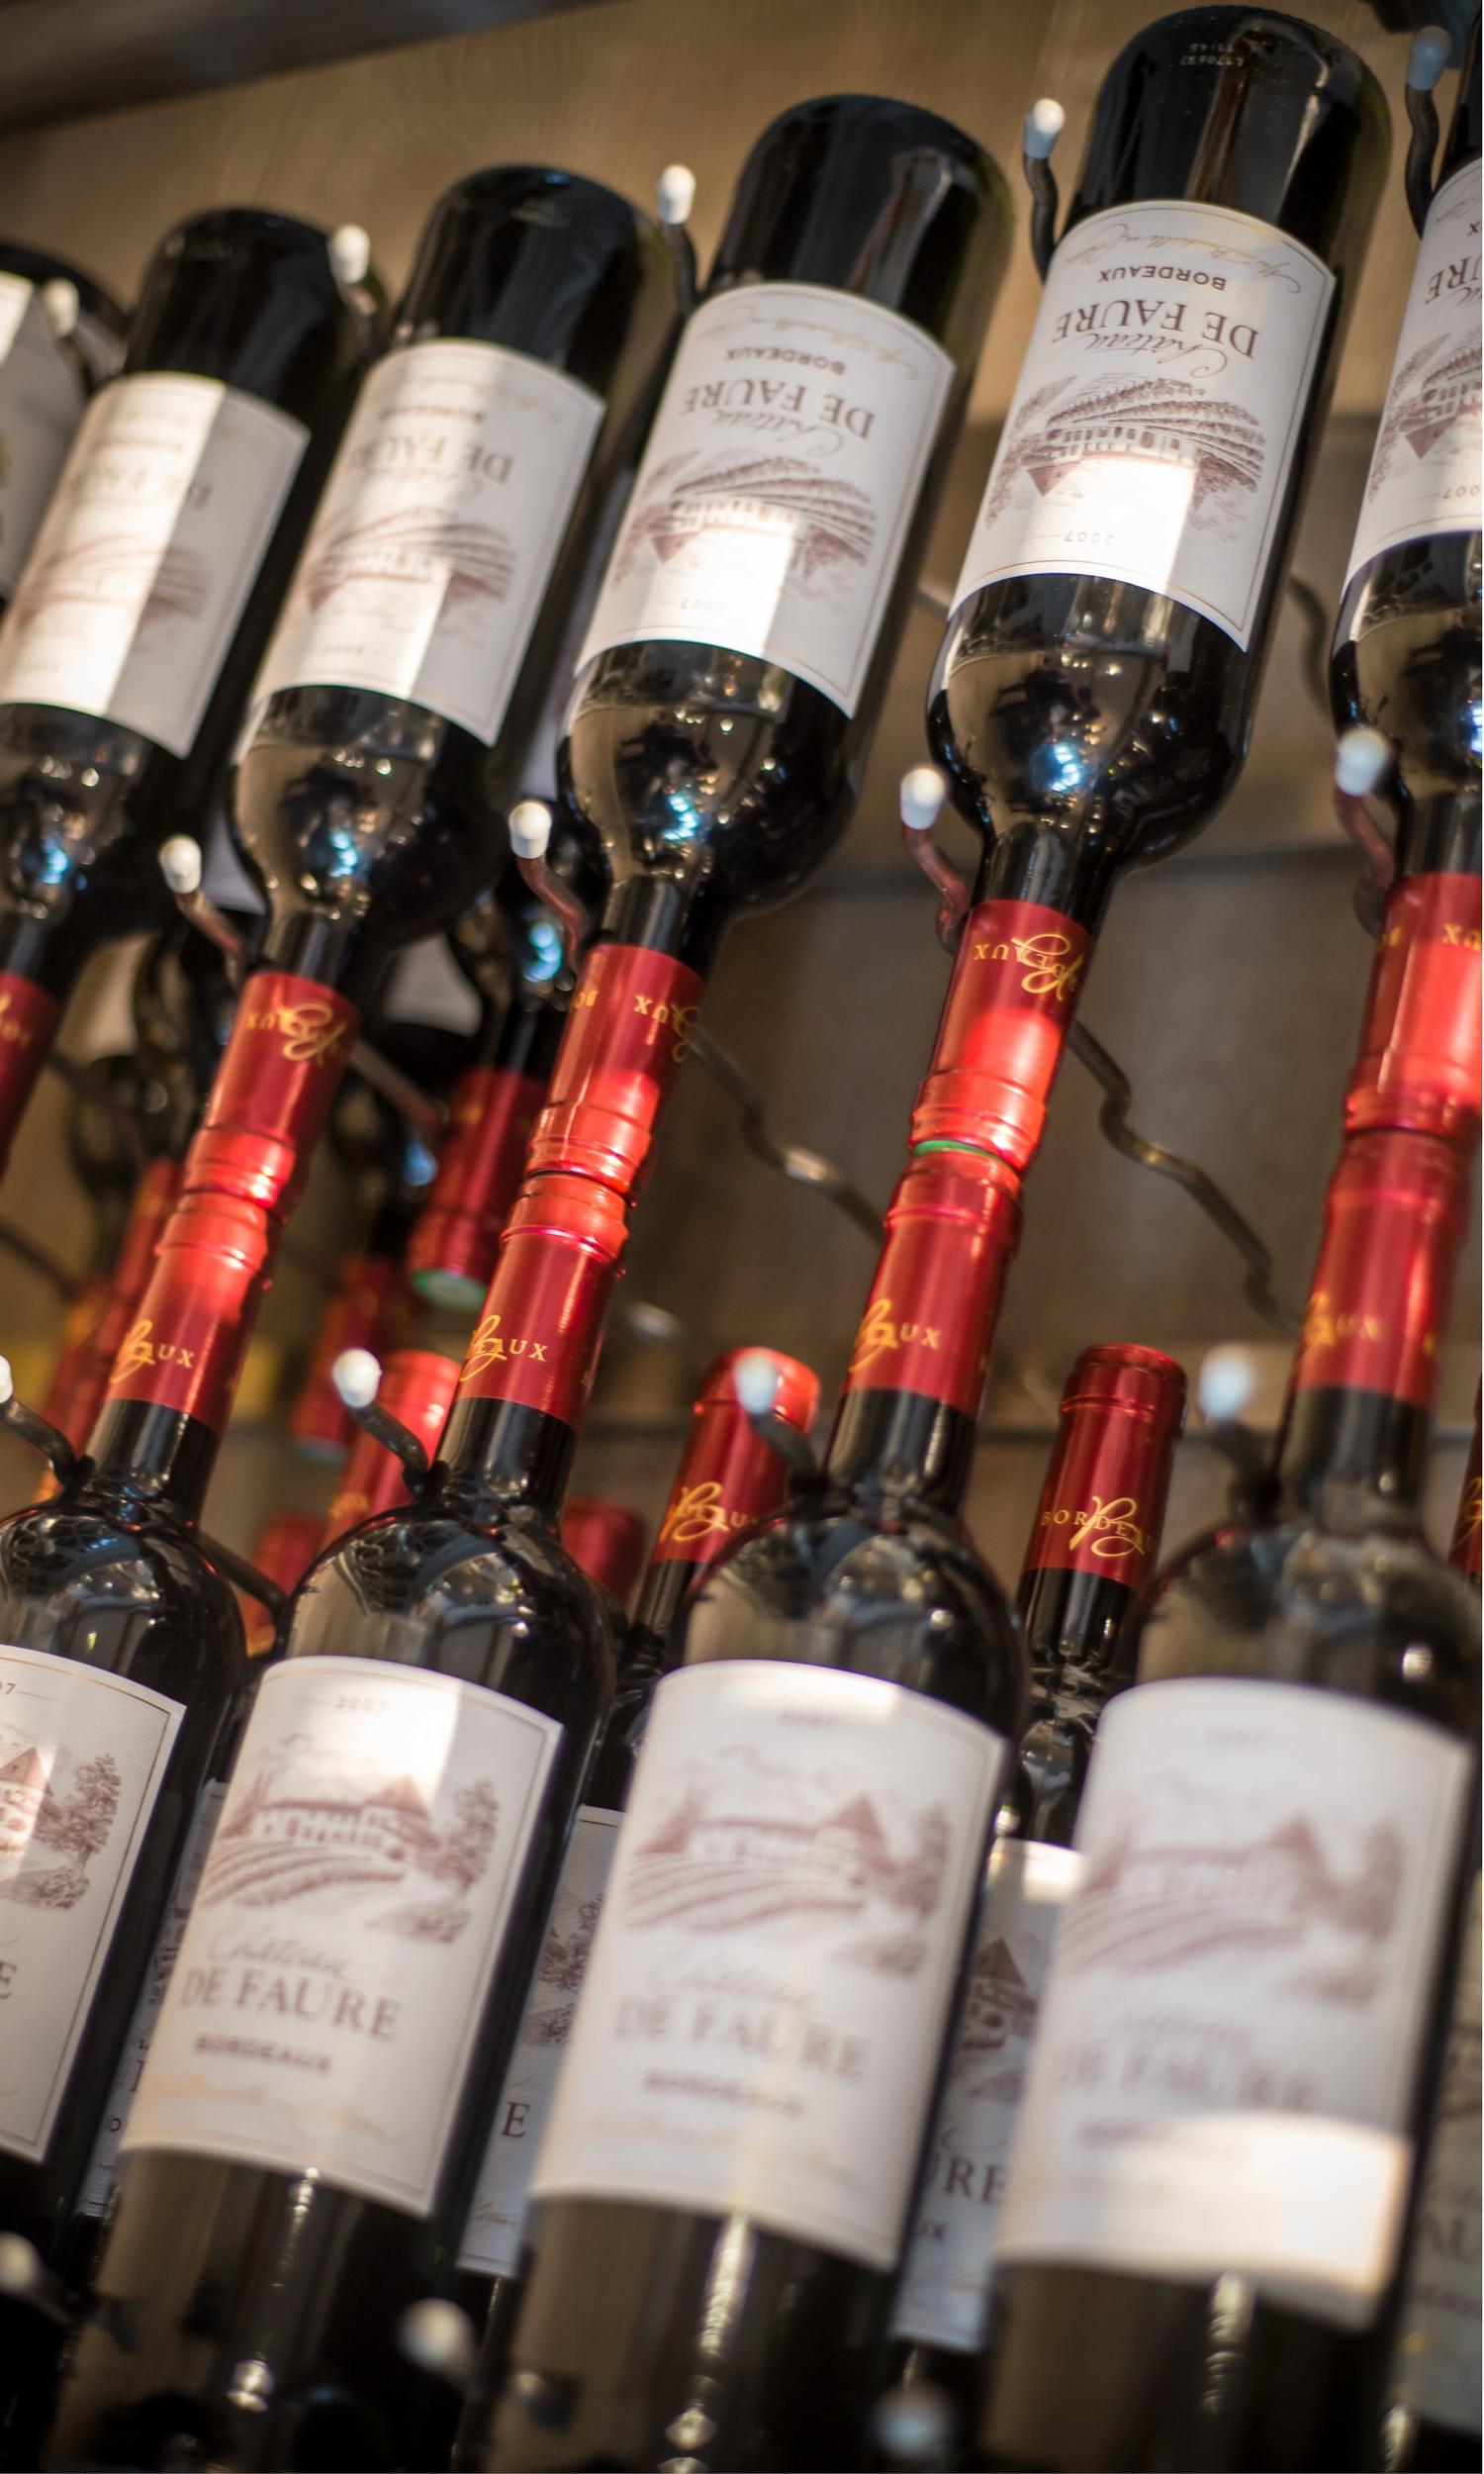 Courchevel Luxury rental variety of wines